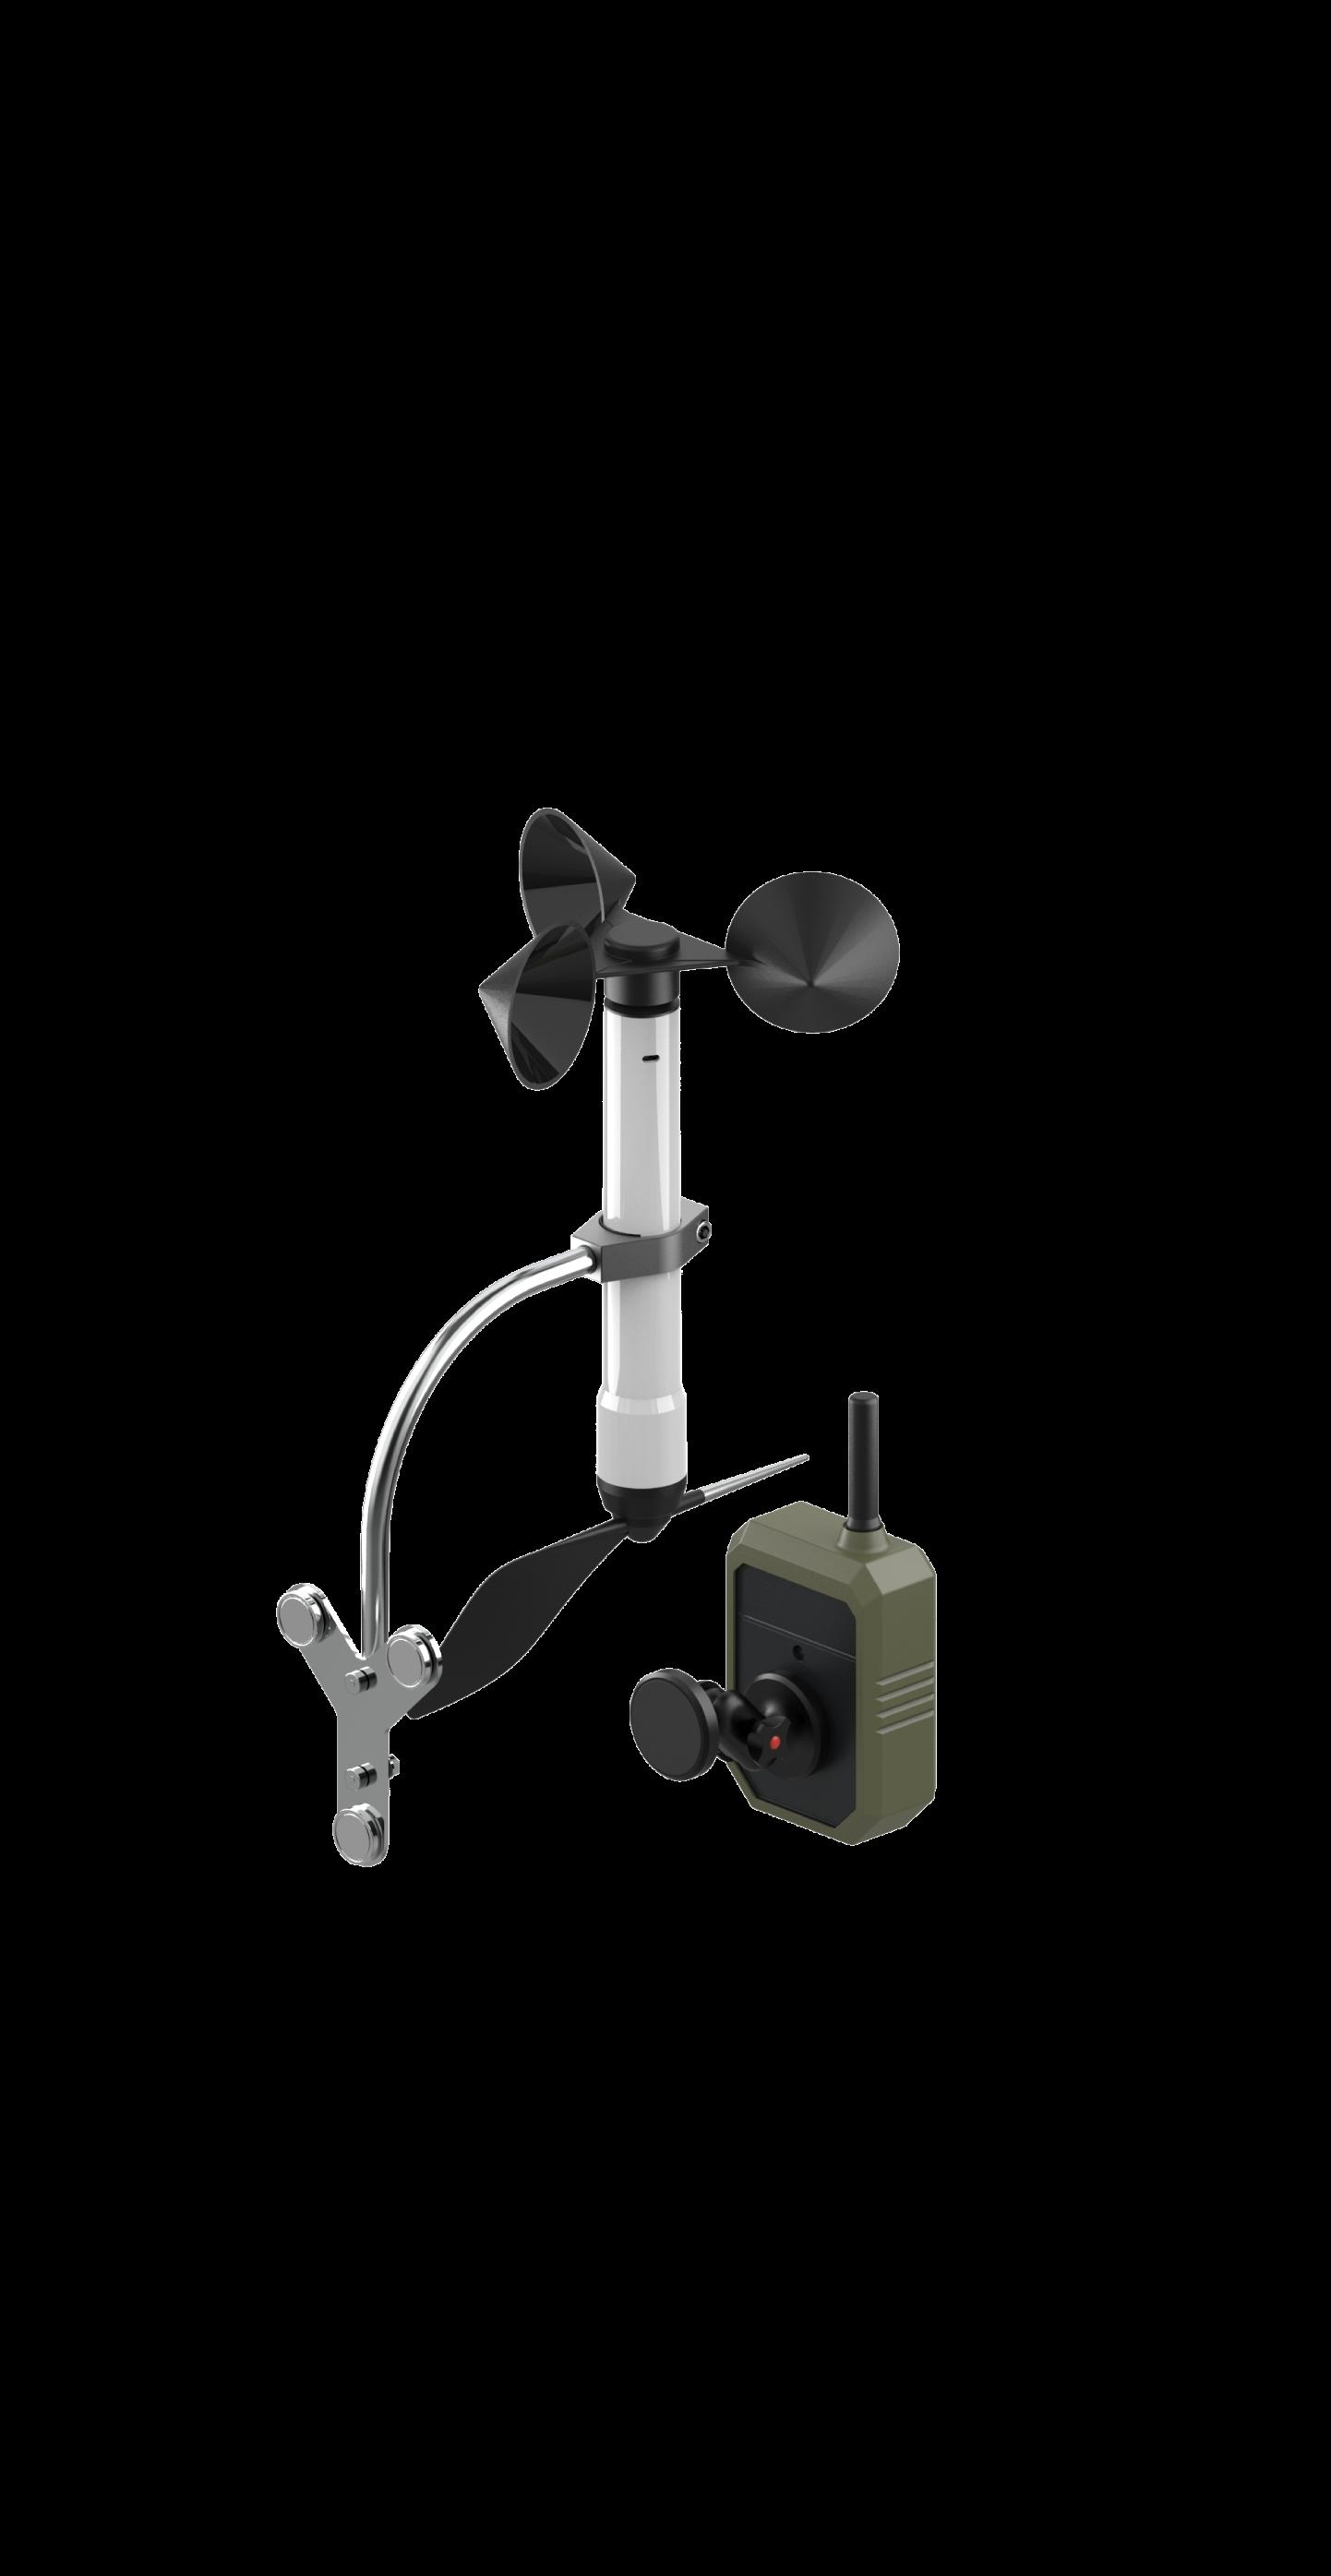 WL-21 wireless anemoeter